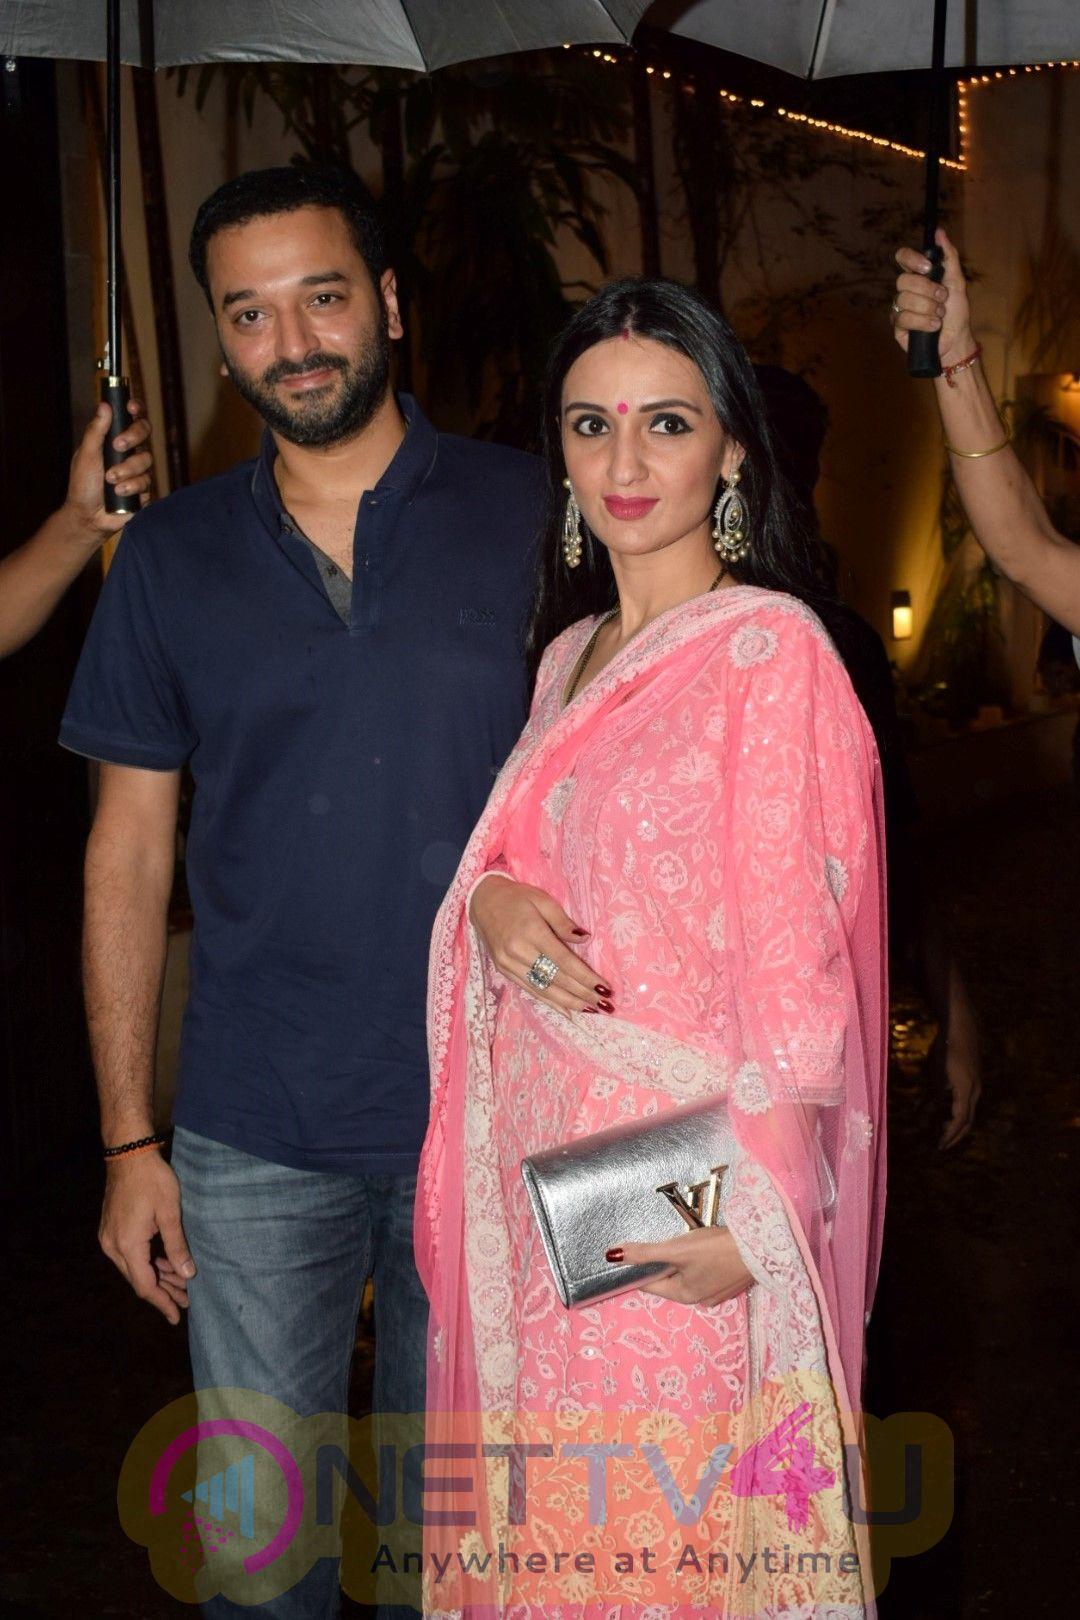 Stills Of Shilpa Shetty, Raveena Tandon Together At Anil Kapoor's House Celebrating Karwa Chauth